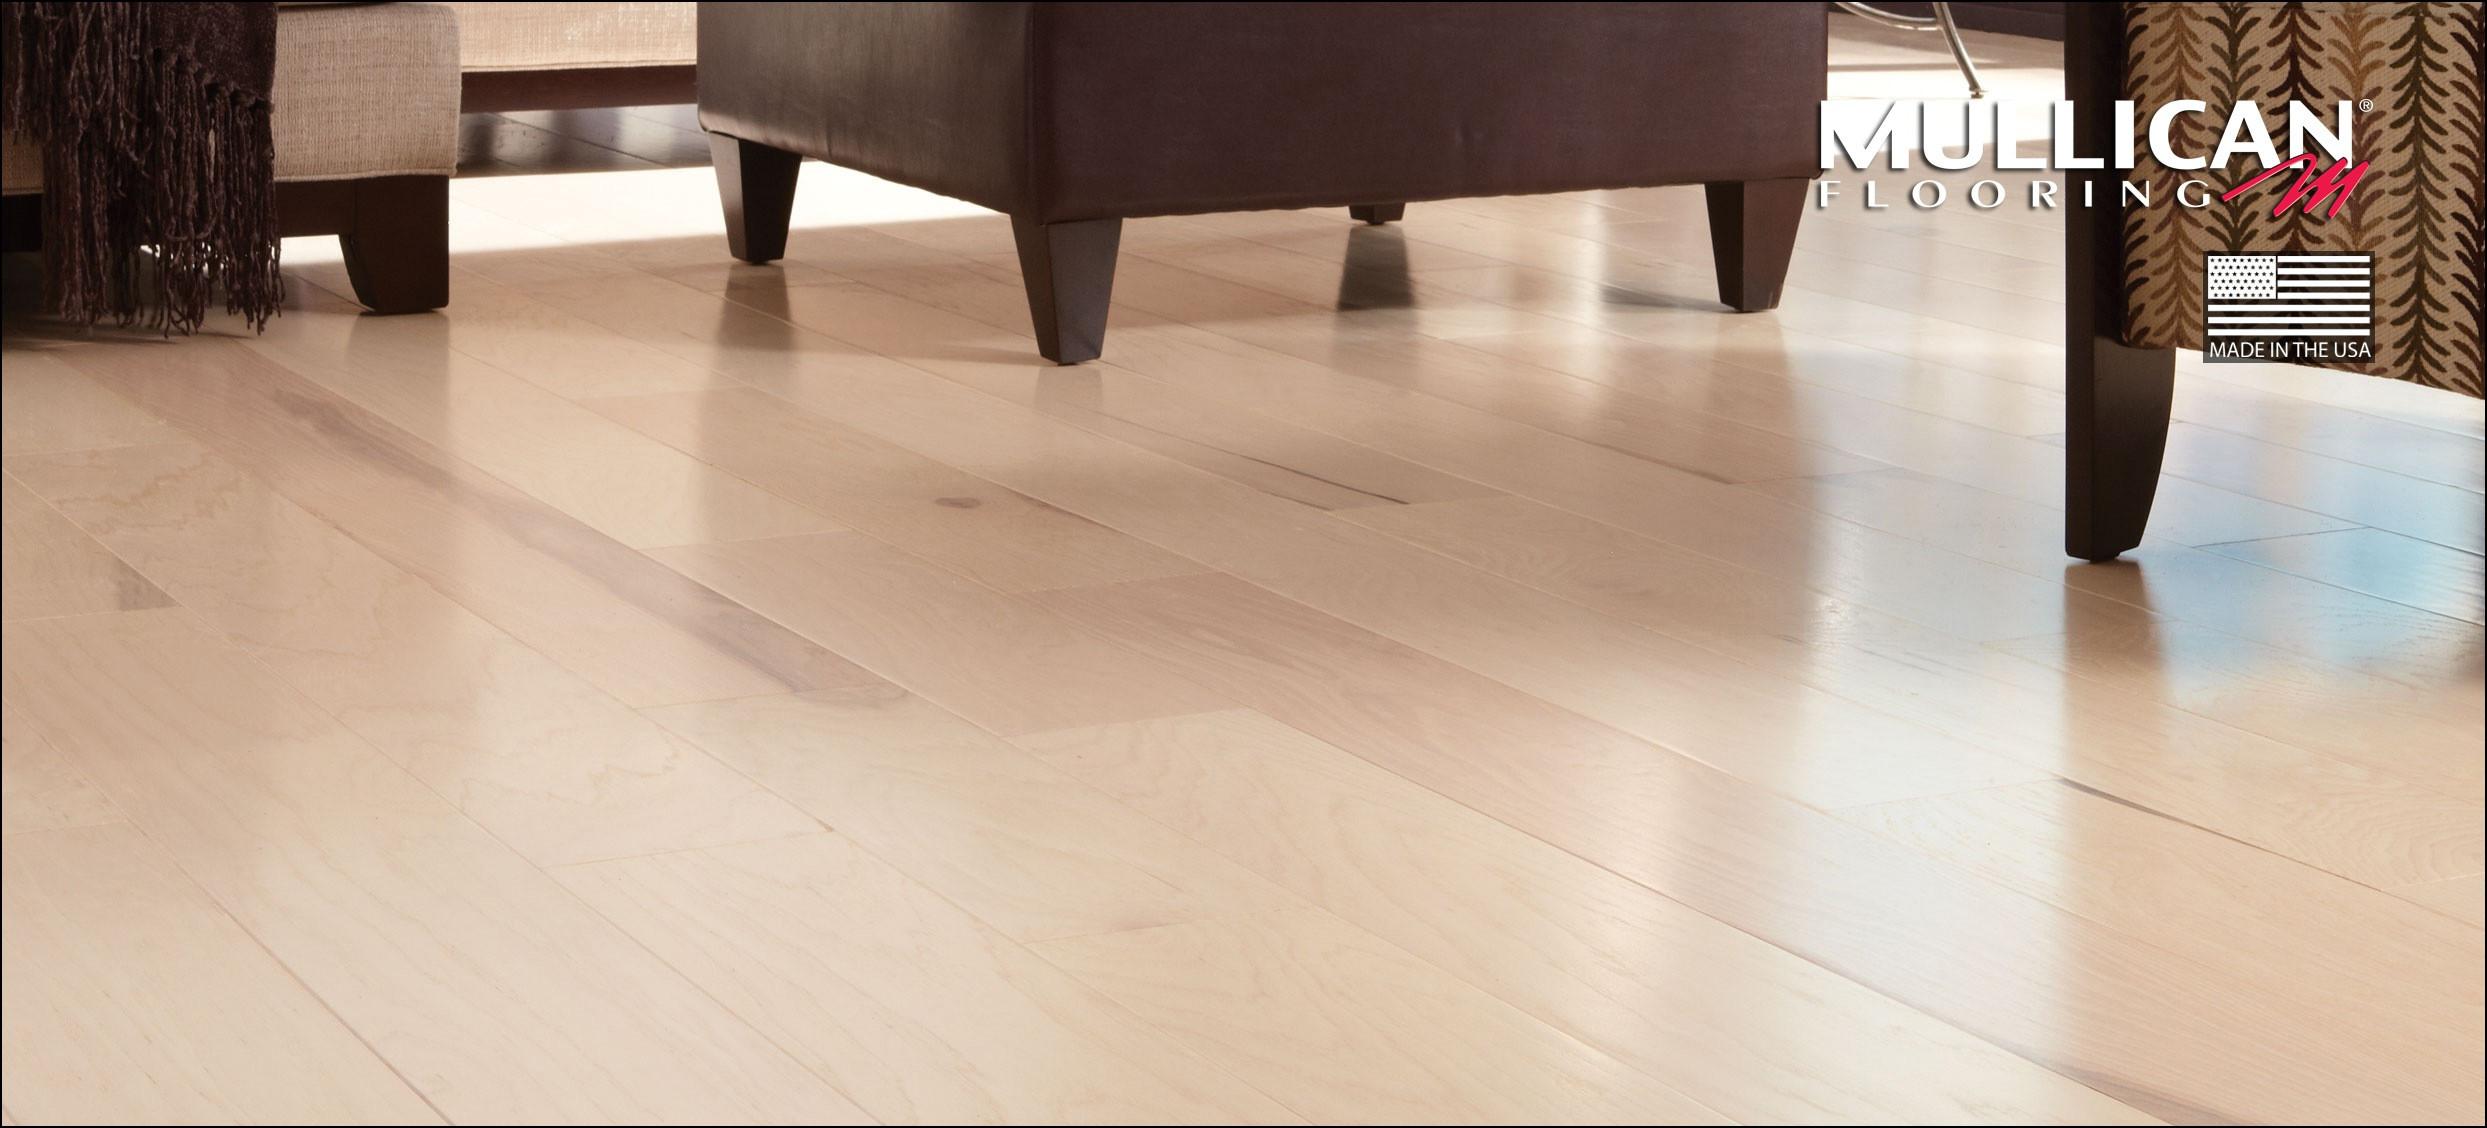 best price hardwood flooring toronto of hardwood flooring suppliers france flooring ideas within hardwood flooring installation san diego mullican flooring home of hardwood flooring installation san diego